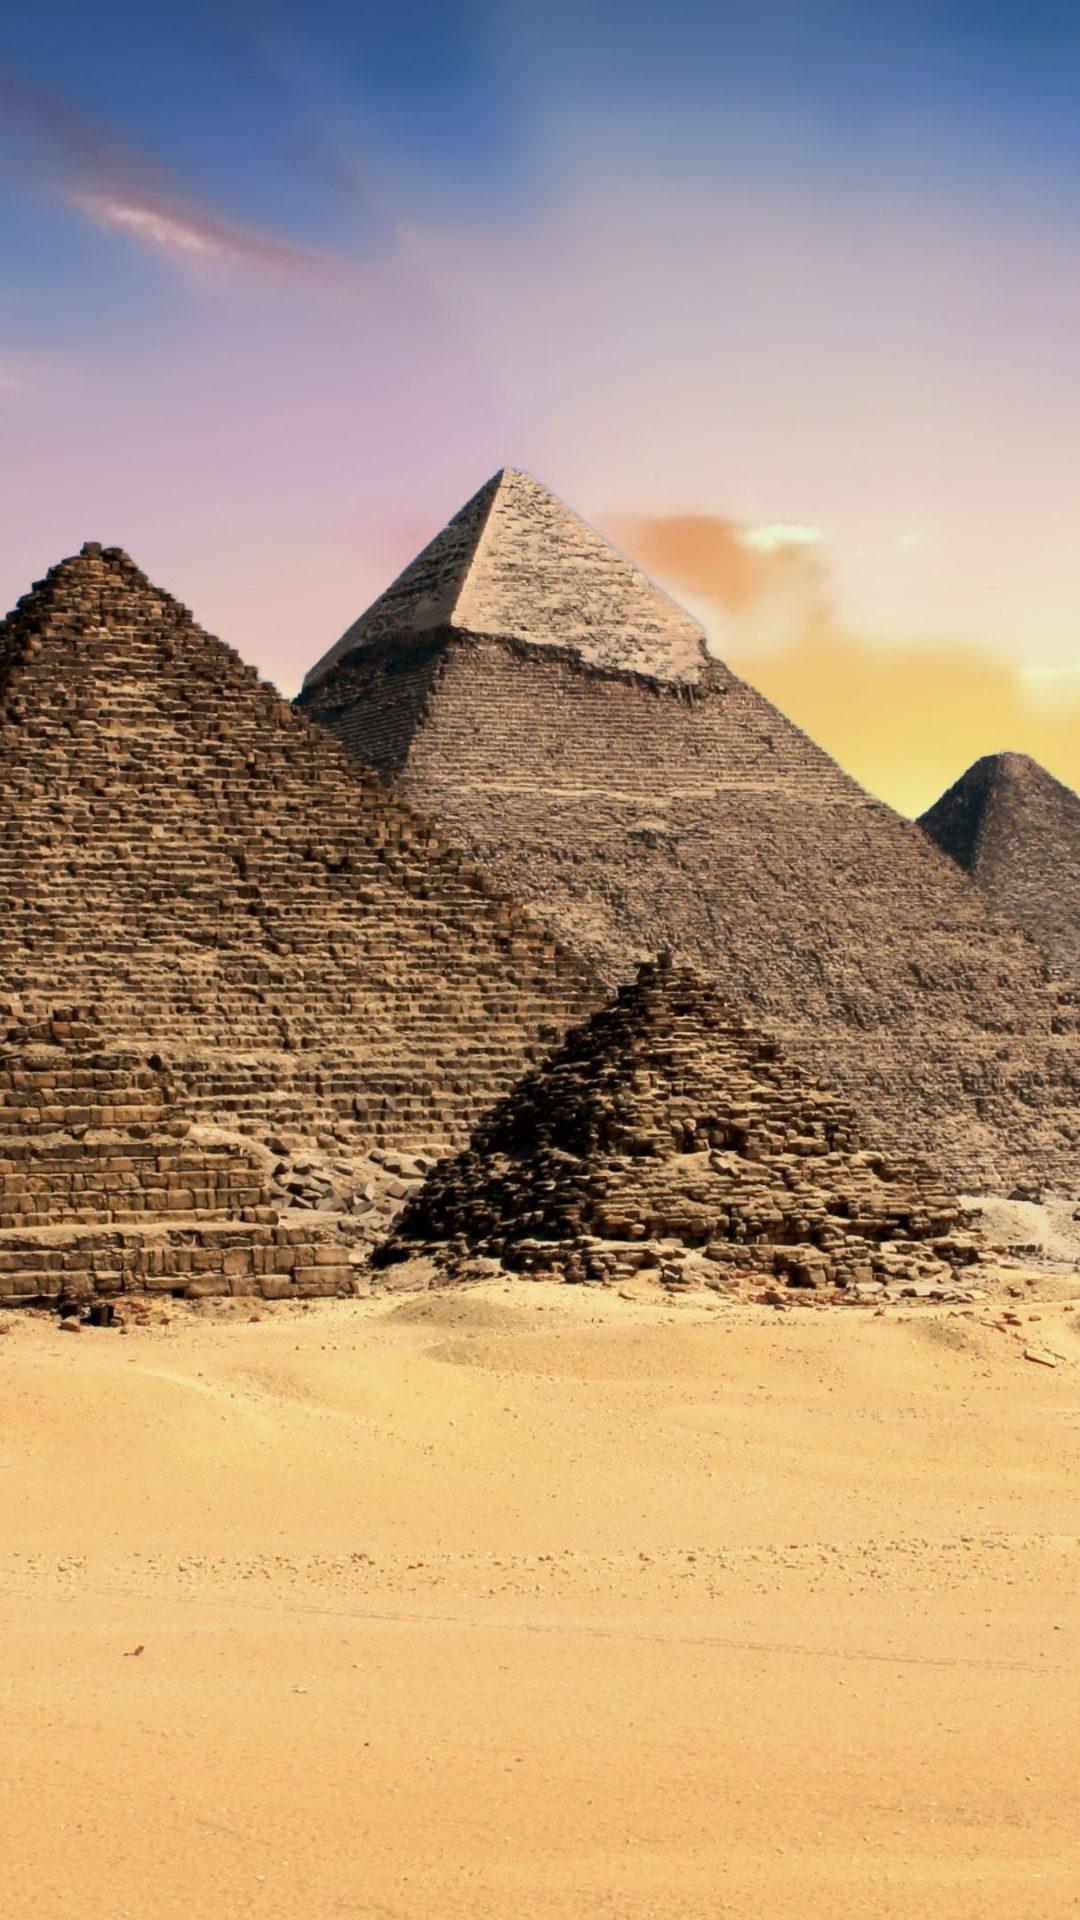 Iphone 4 Heart Wallpaper The Giza Pyramid Complex 4k Uhd Wallpaper Hd Wallpaper